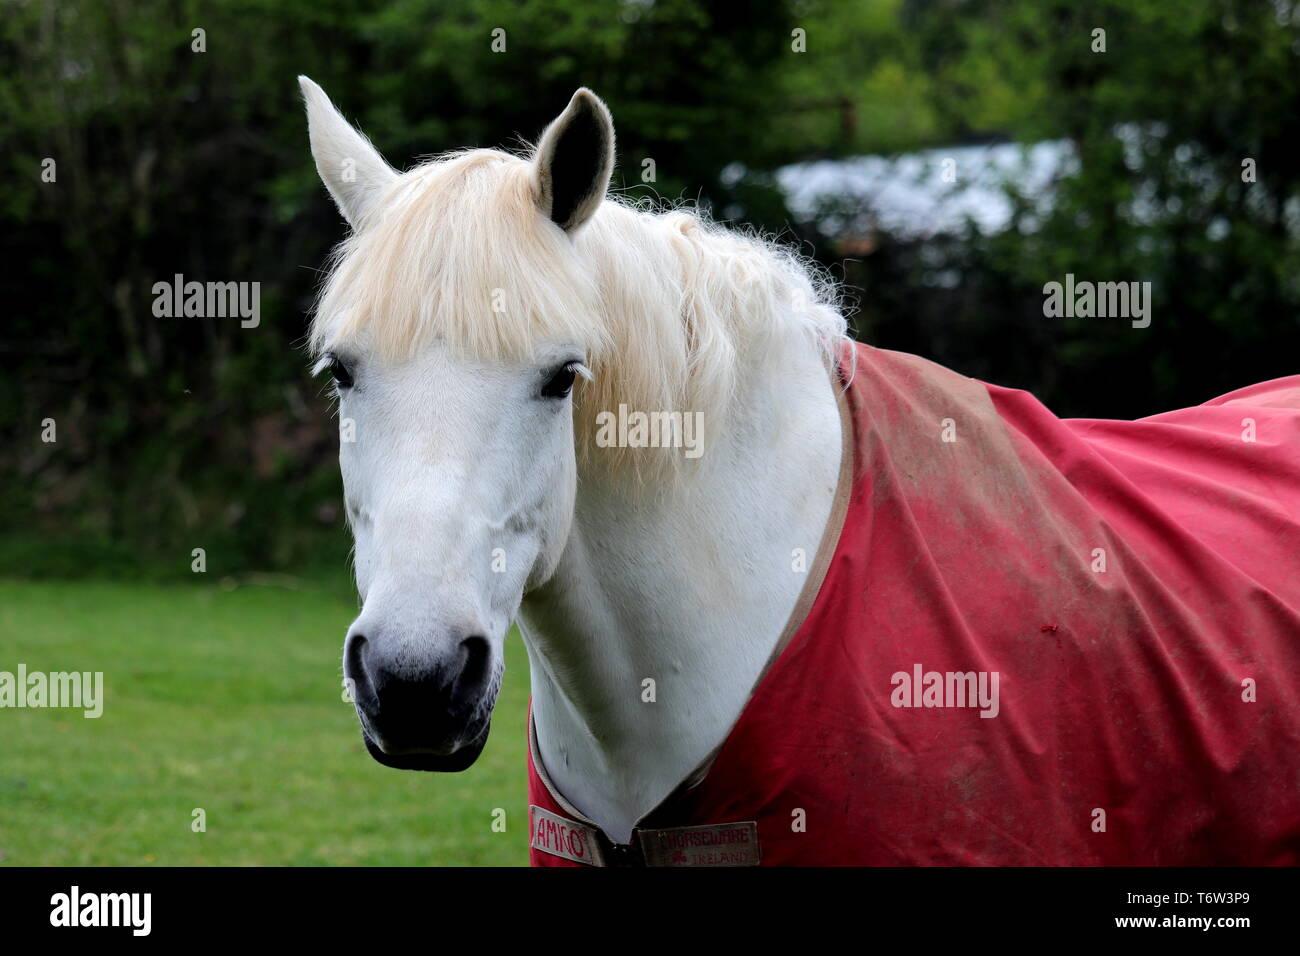 Horse Front Portrait. Horse; equus ferus caballus; subspecies equus ferus; equus ferus; - Stock Image